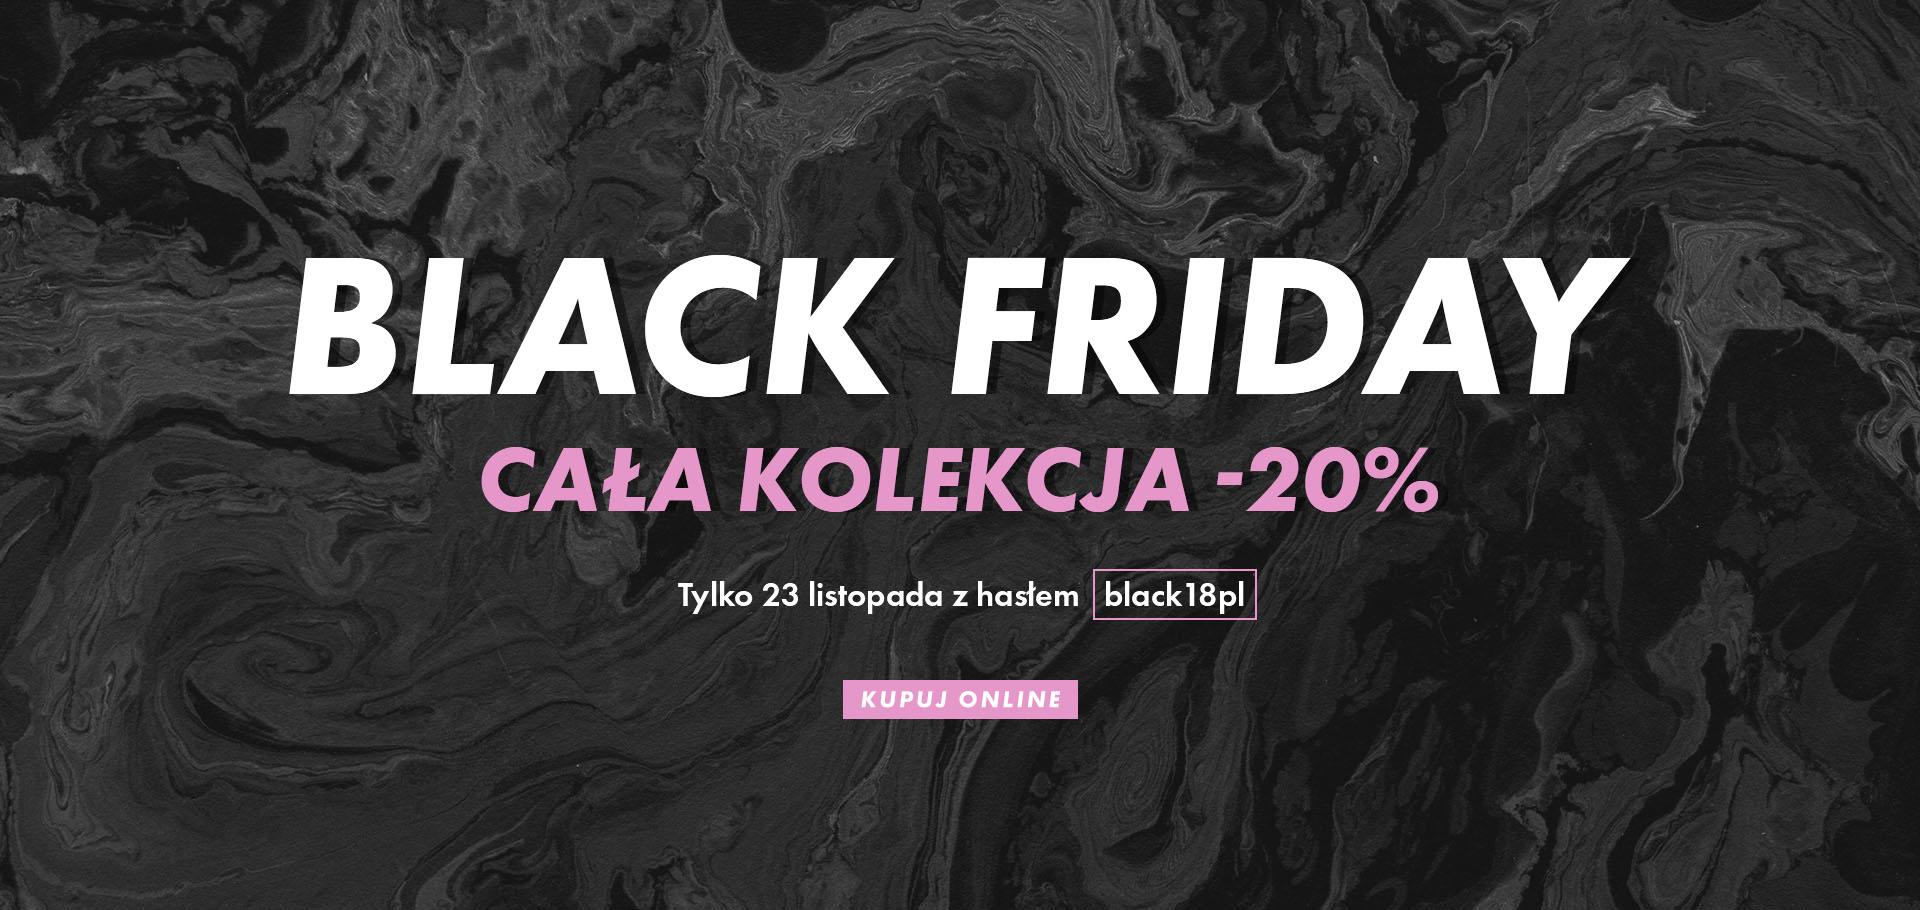 Black Friday Sinsay: 20% rabatu na całą kolekcję                         title=